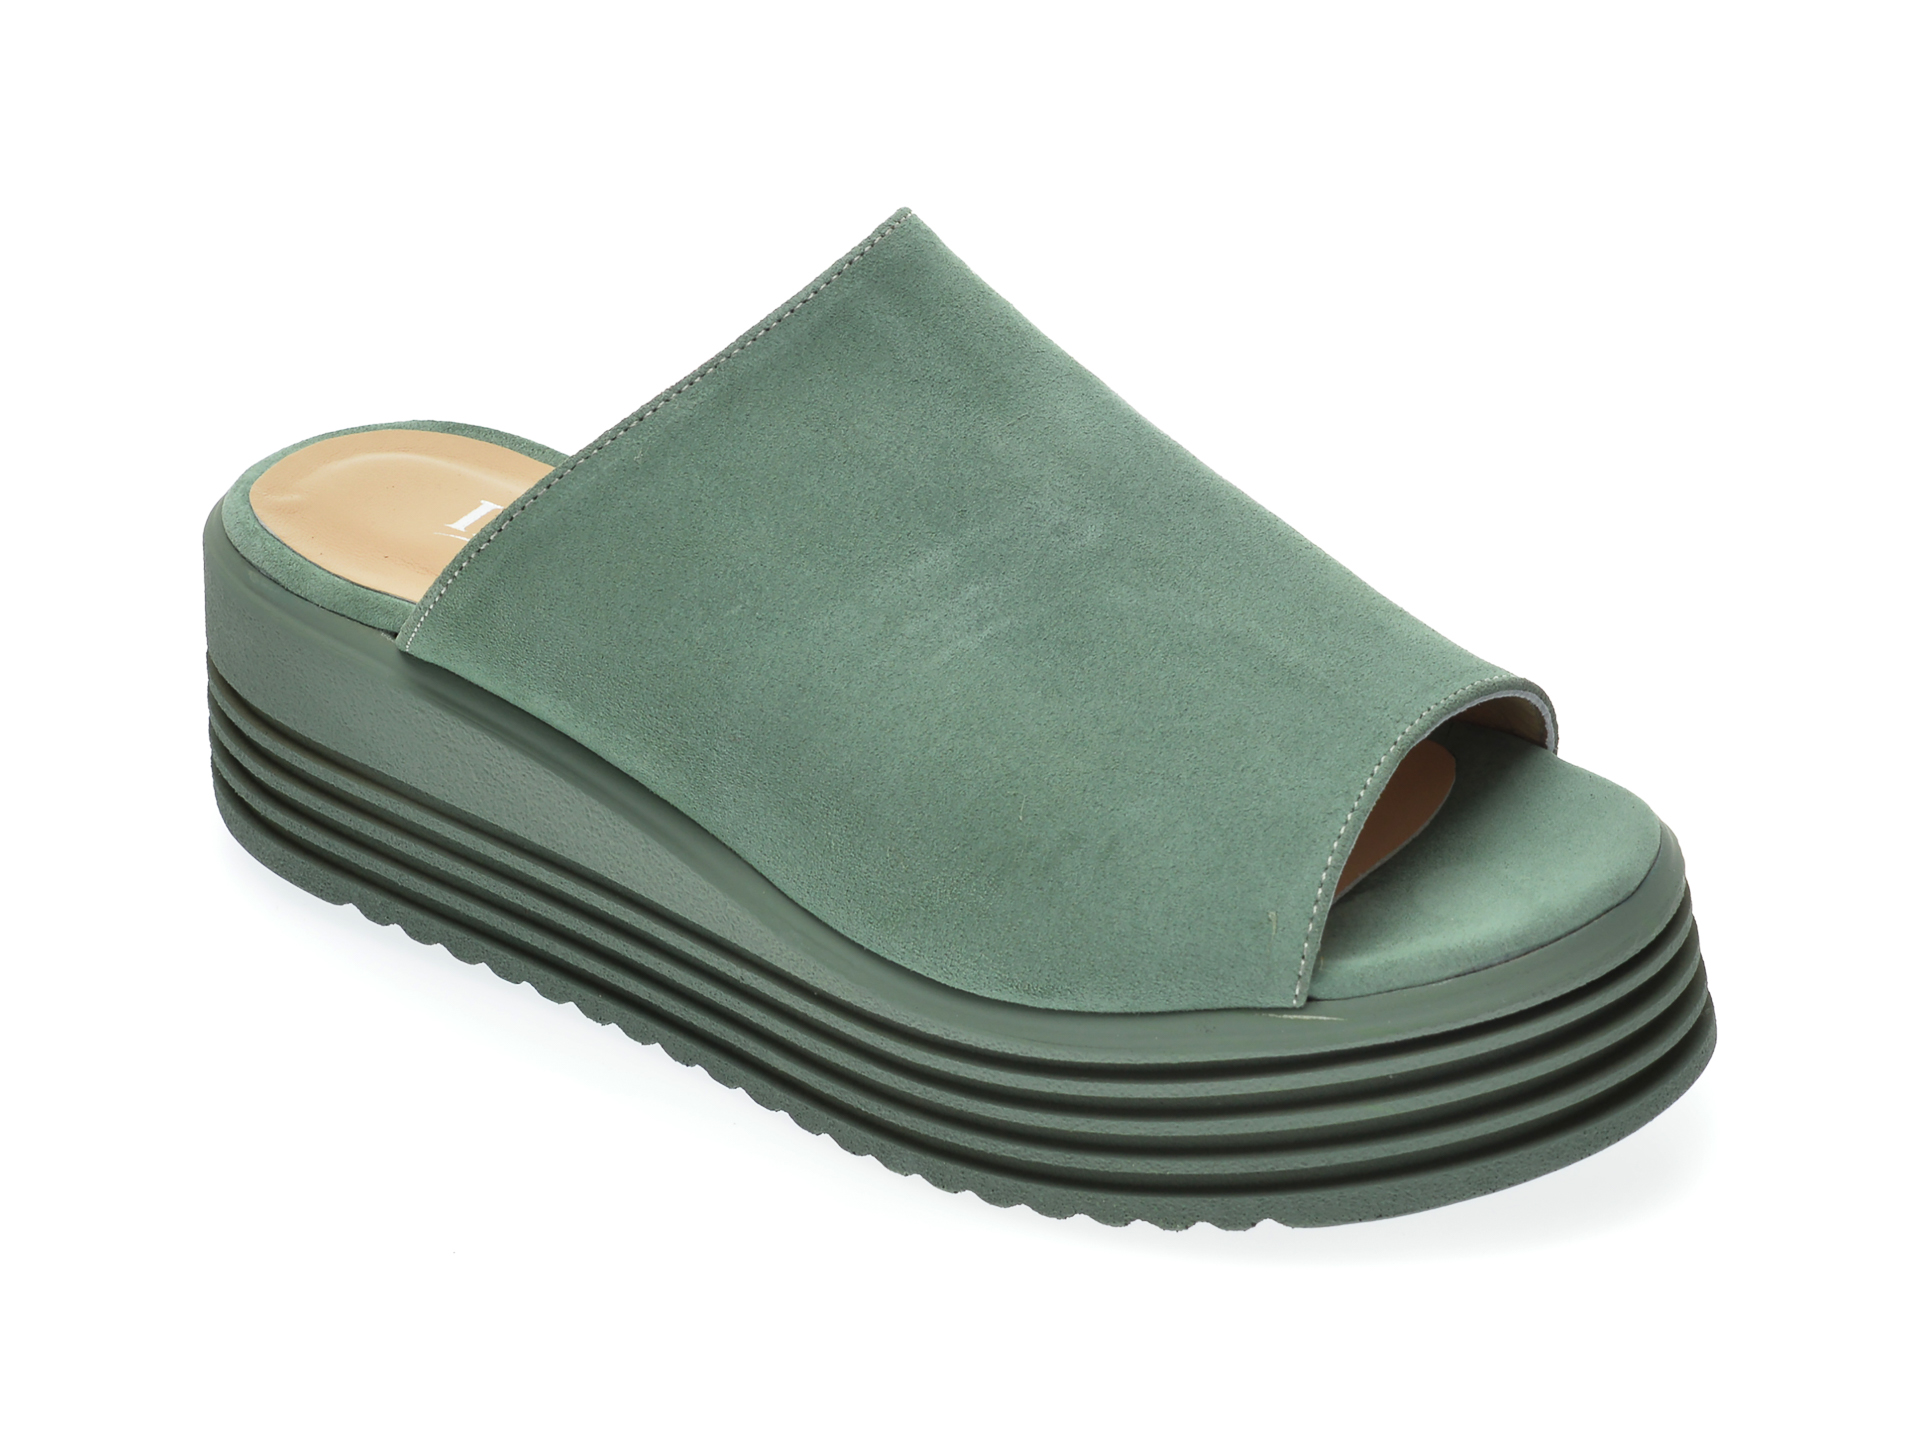 Papuci IMAGE verzi, 20264, din piele naturala imagine otter.ro